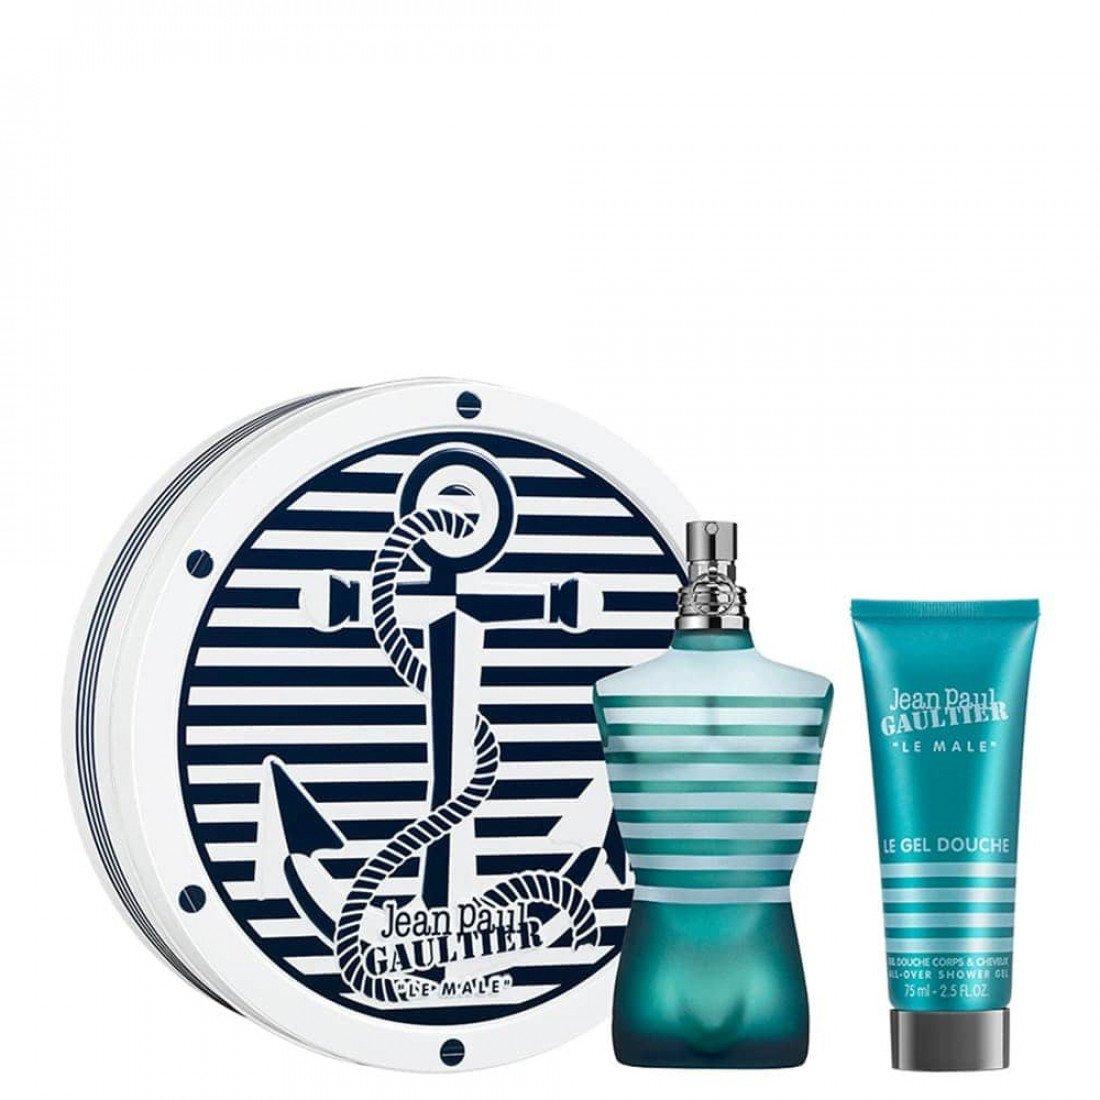 jean_paul_gaultier_le_male_125ml_eau_de_toilette_gift_set_2